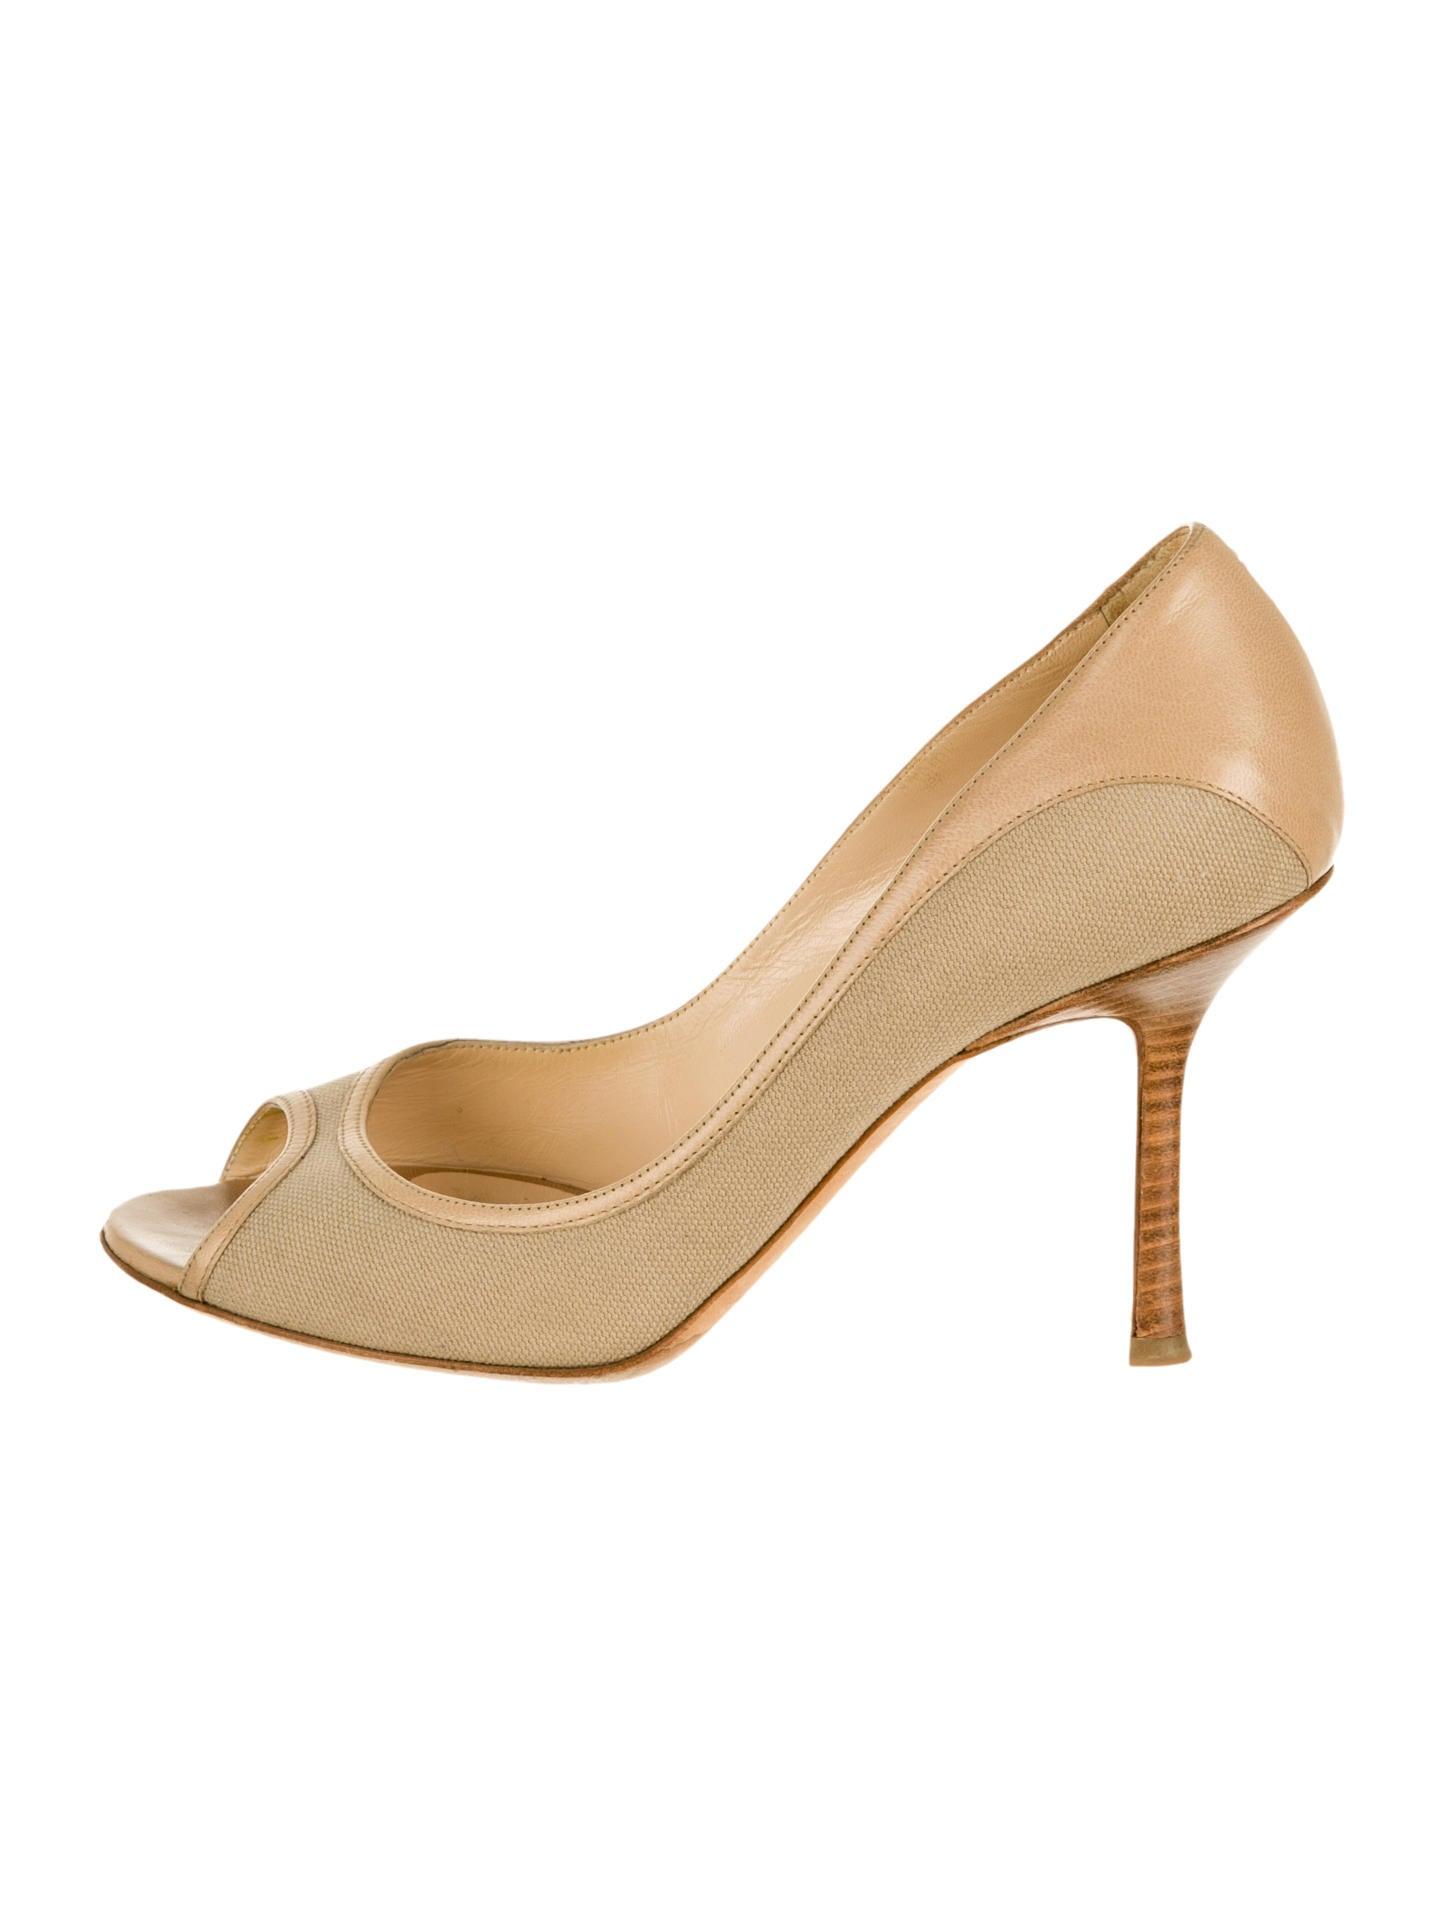 jimmy choo pumps shoes jim29956 the realreal